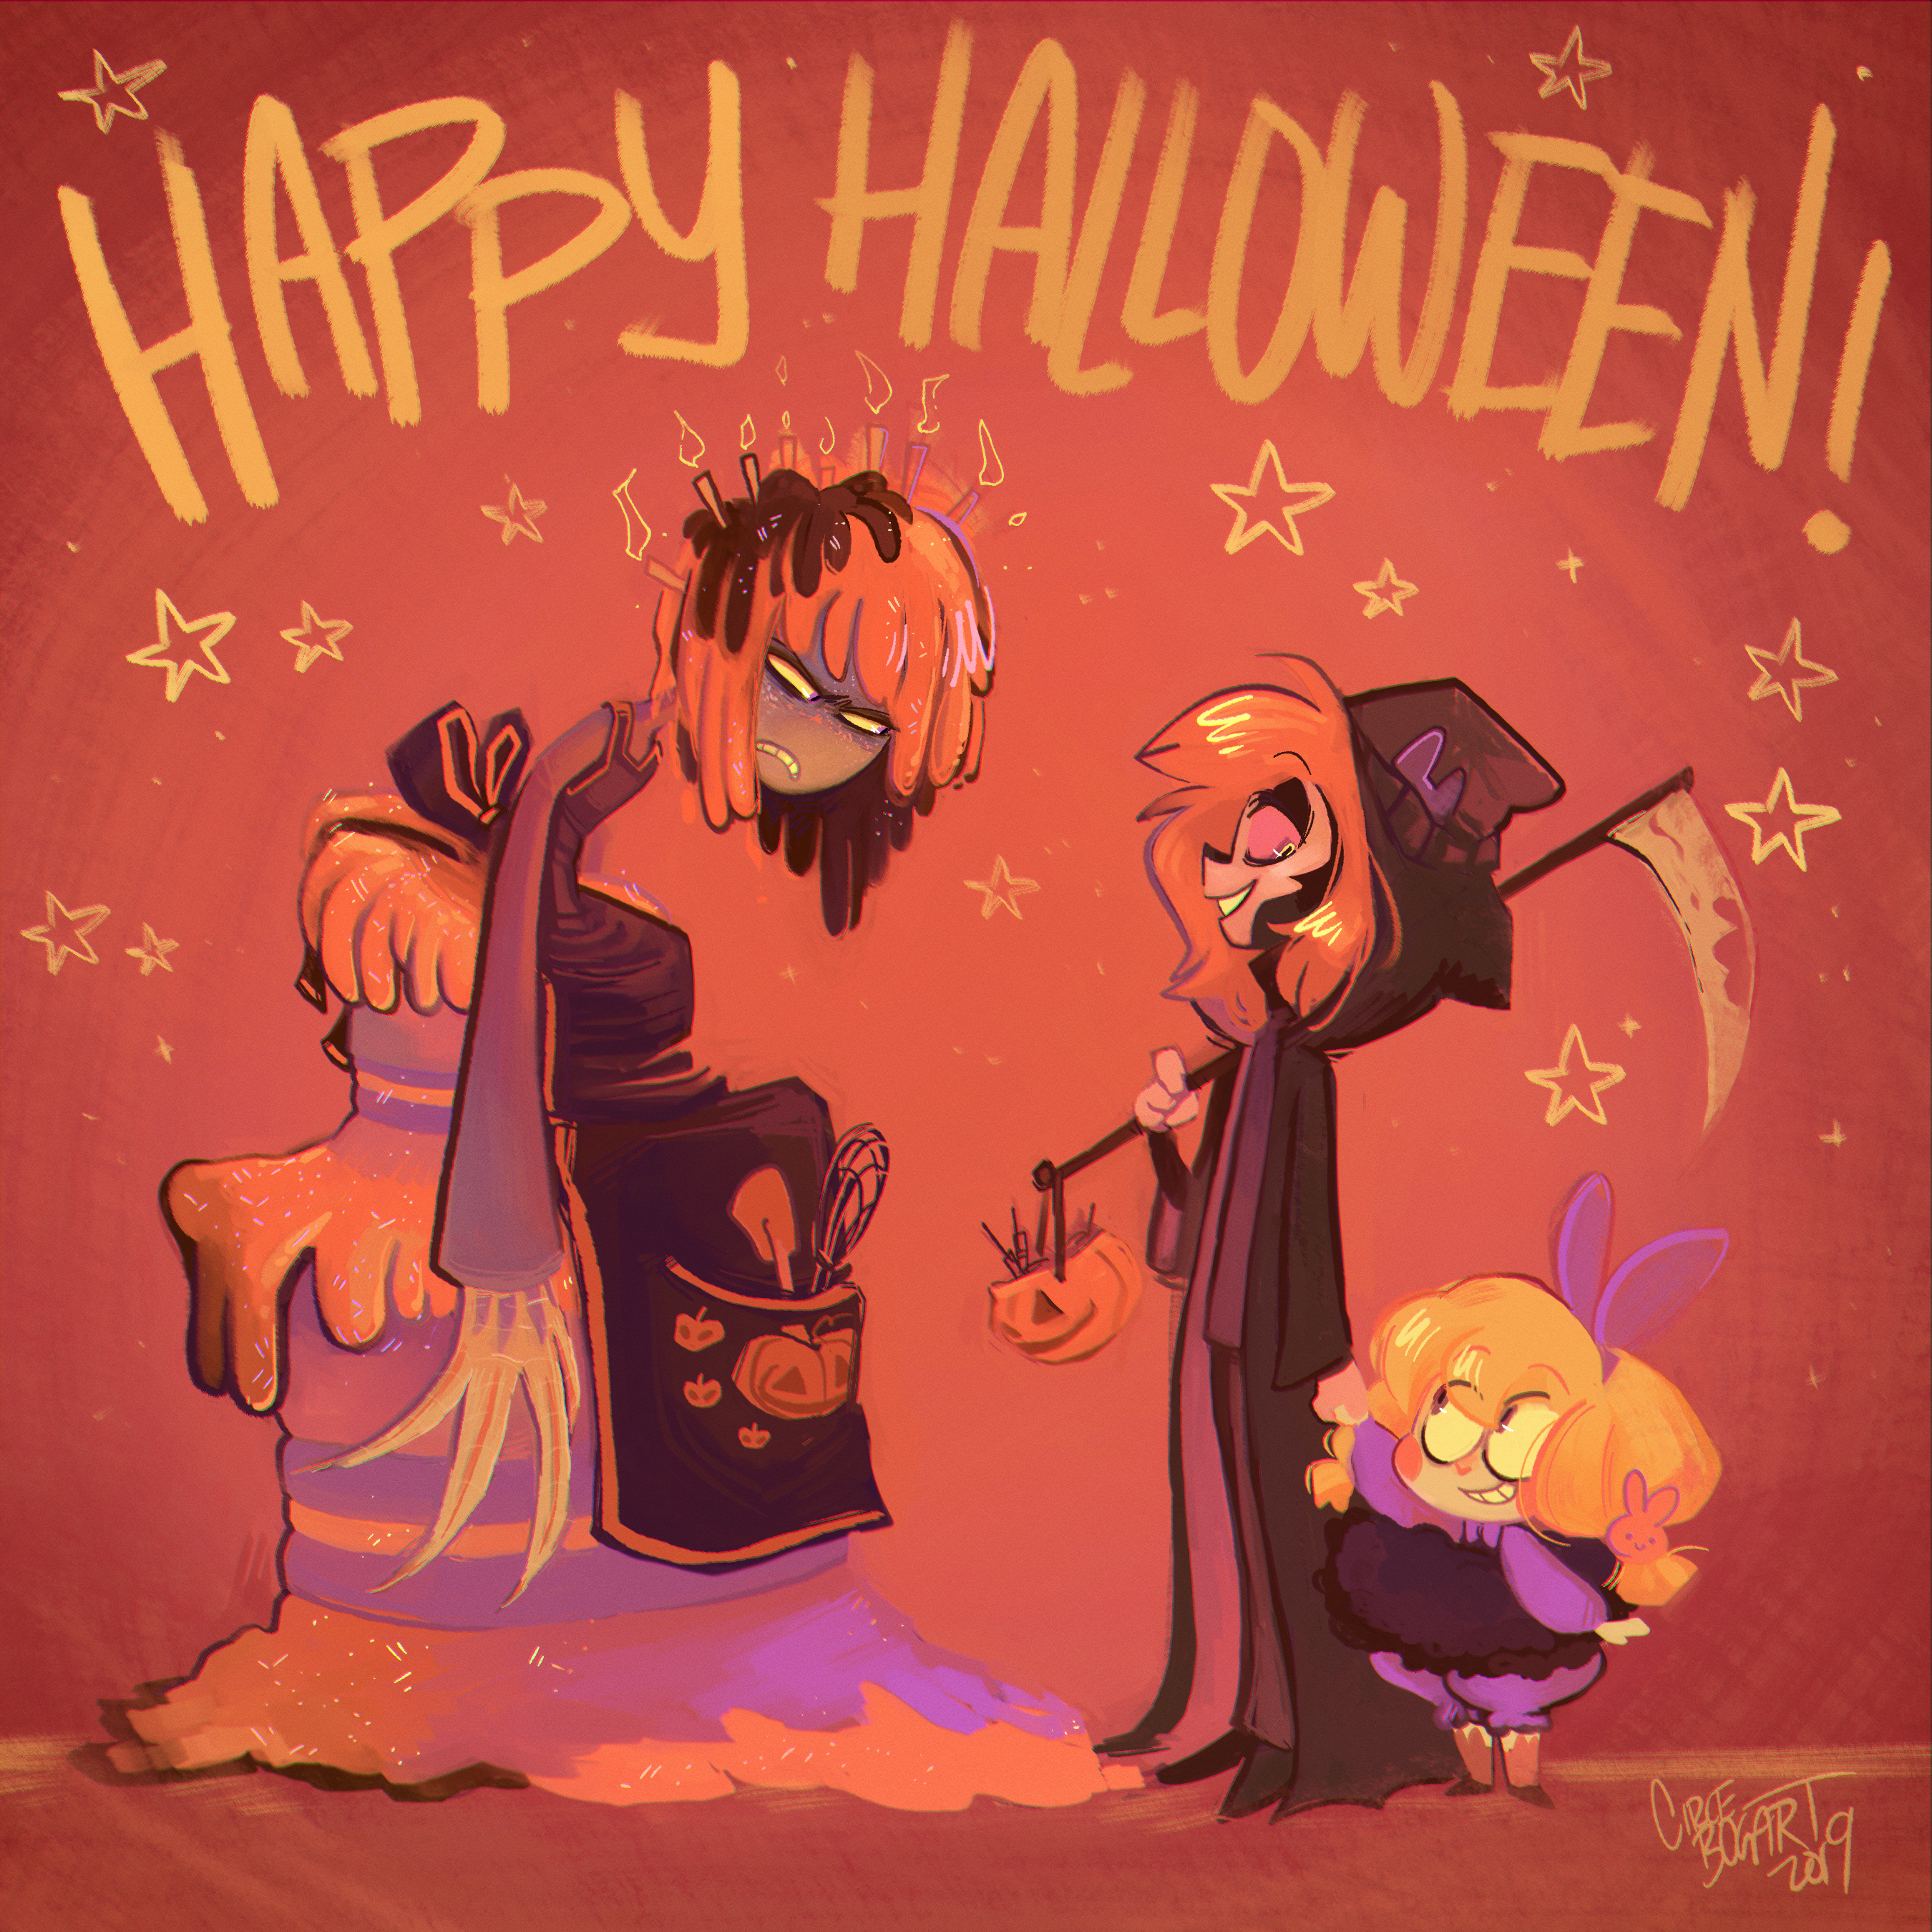 Happy Halloween 2019!